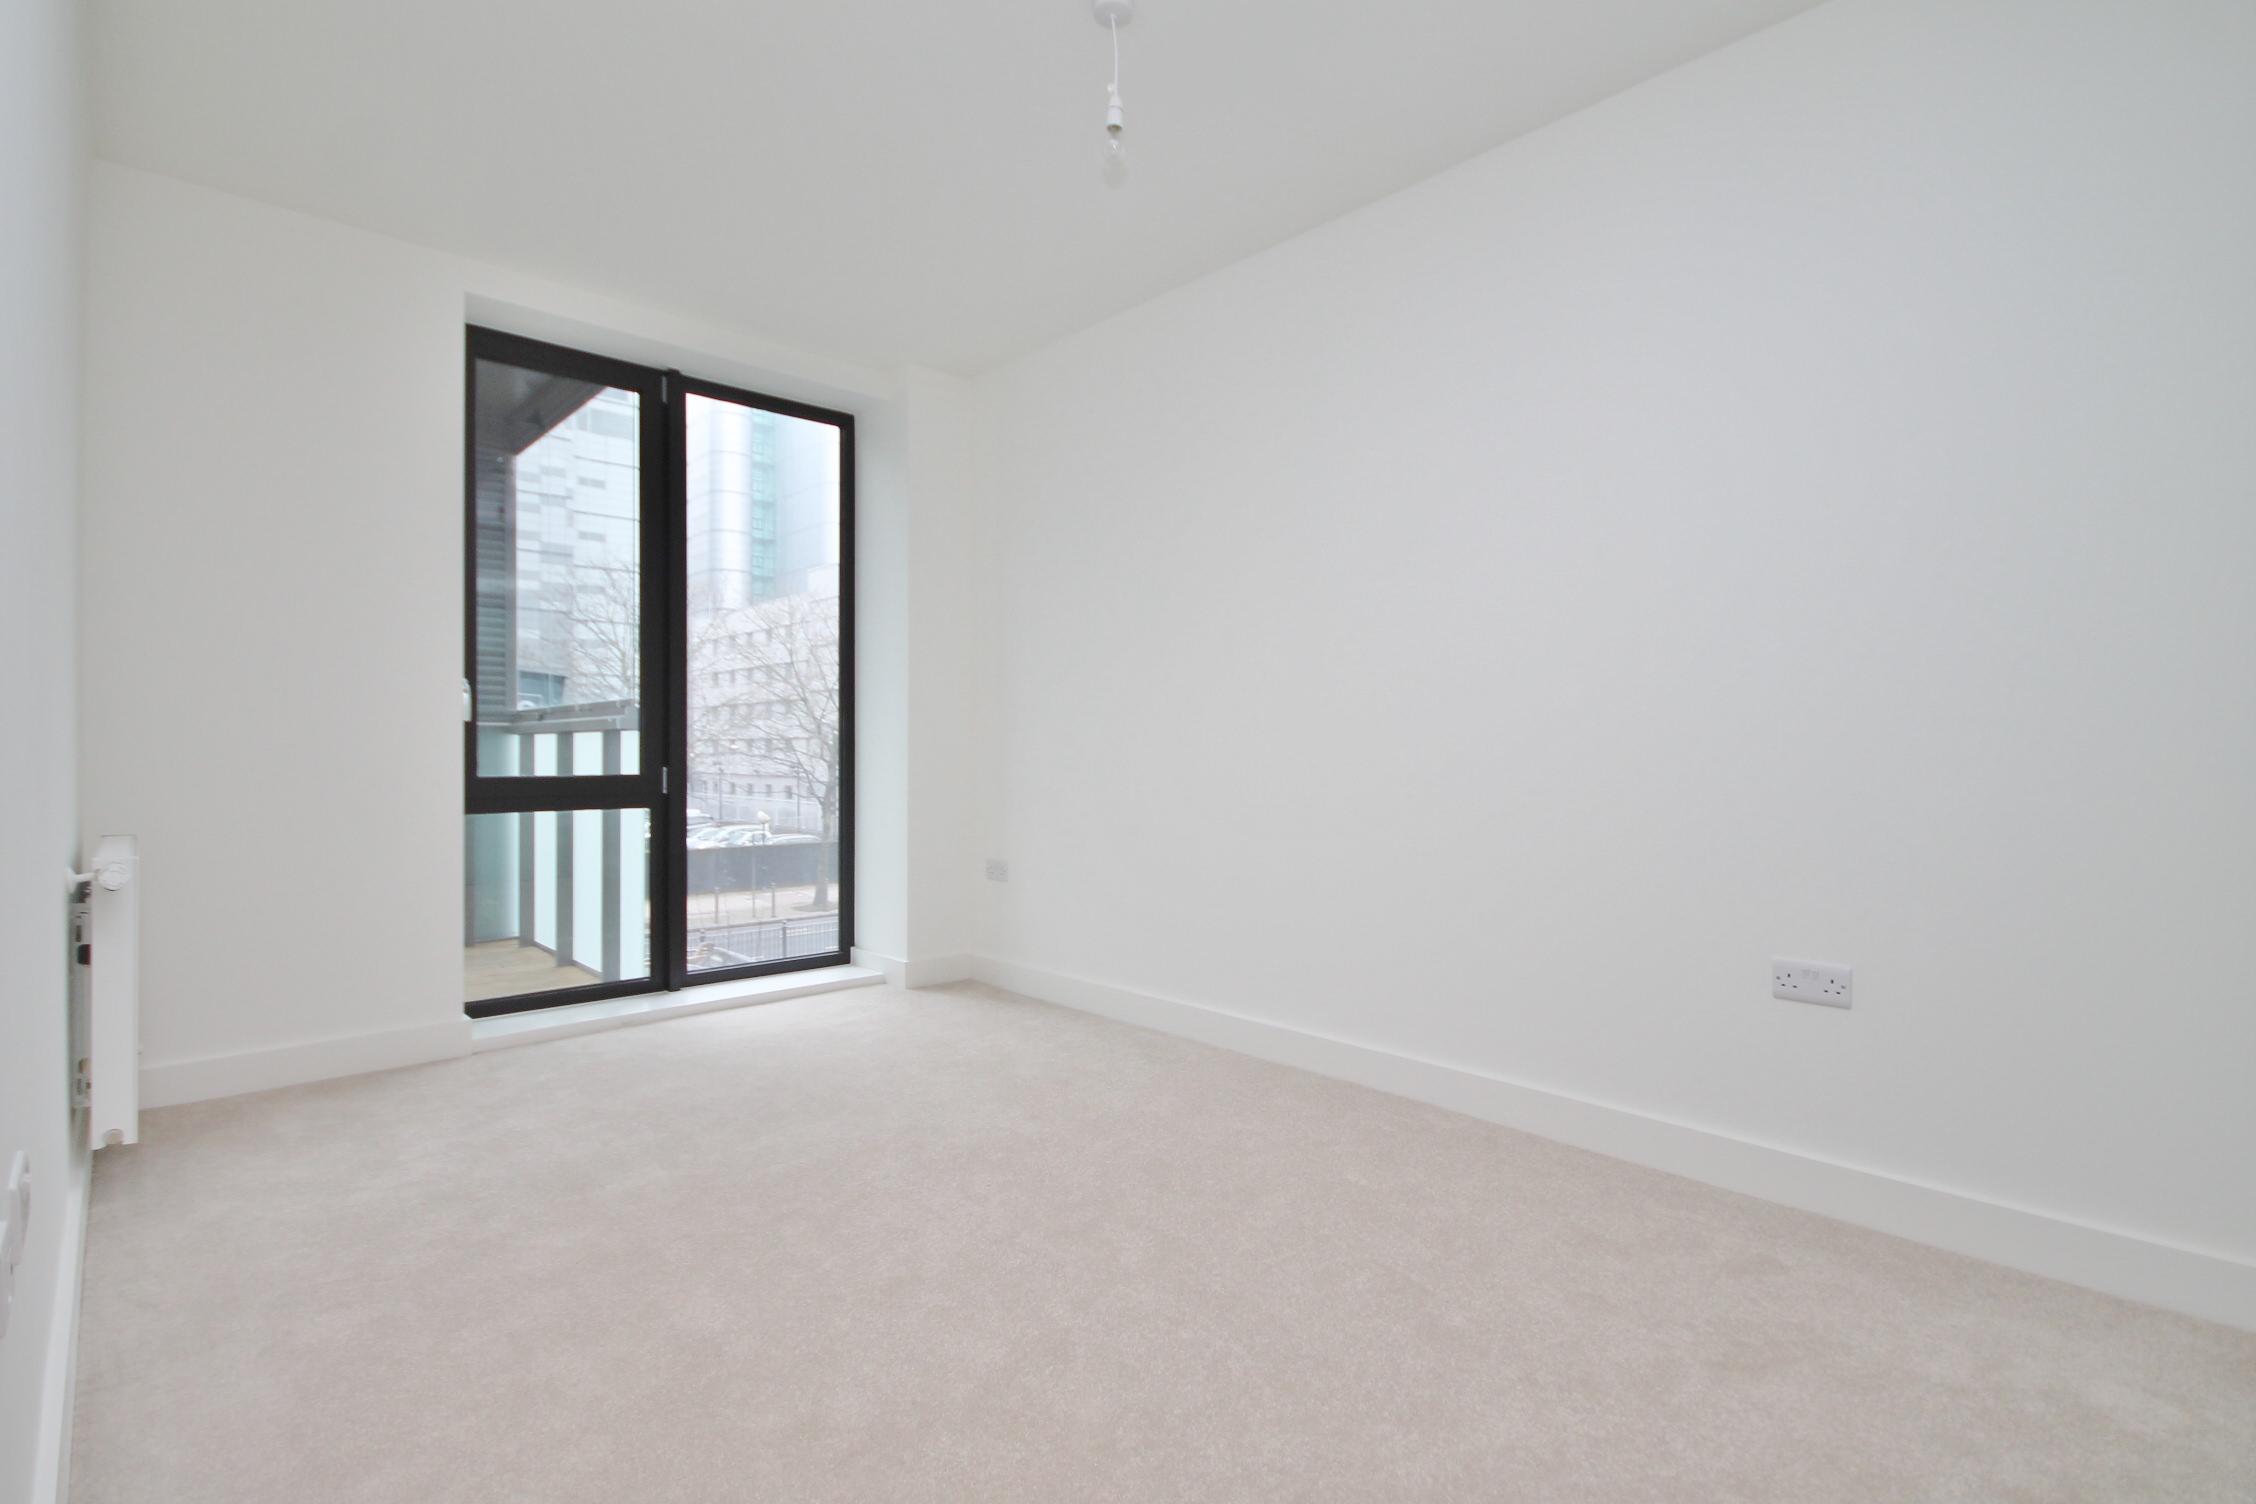 1 bed flat for sale in Aberfeldy Village  - Property Image 4